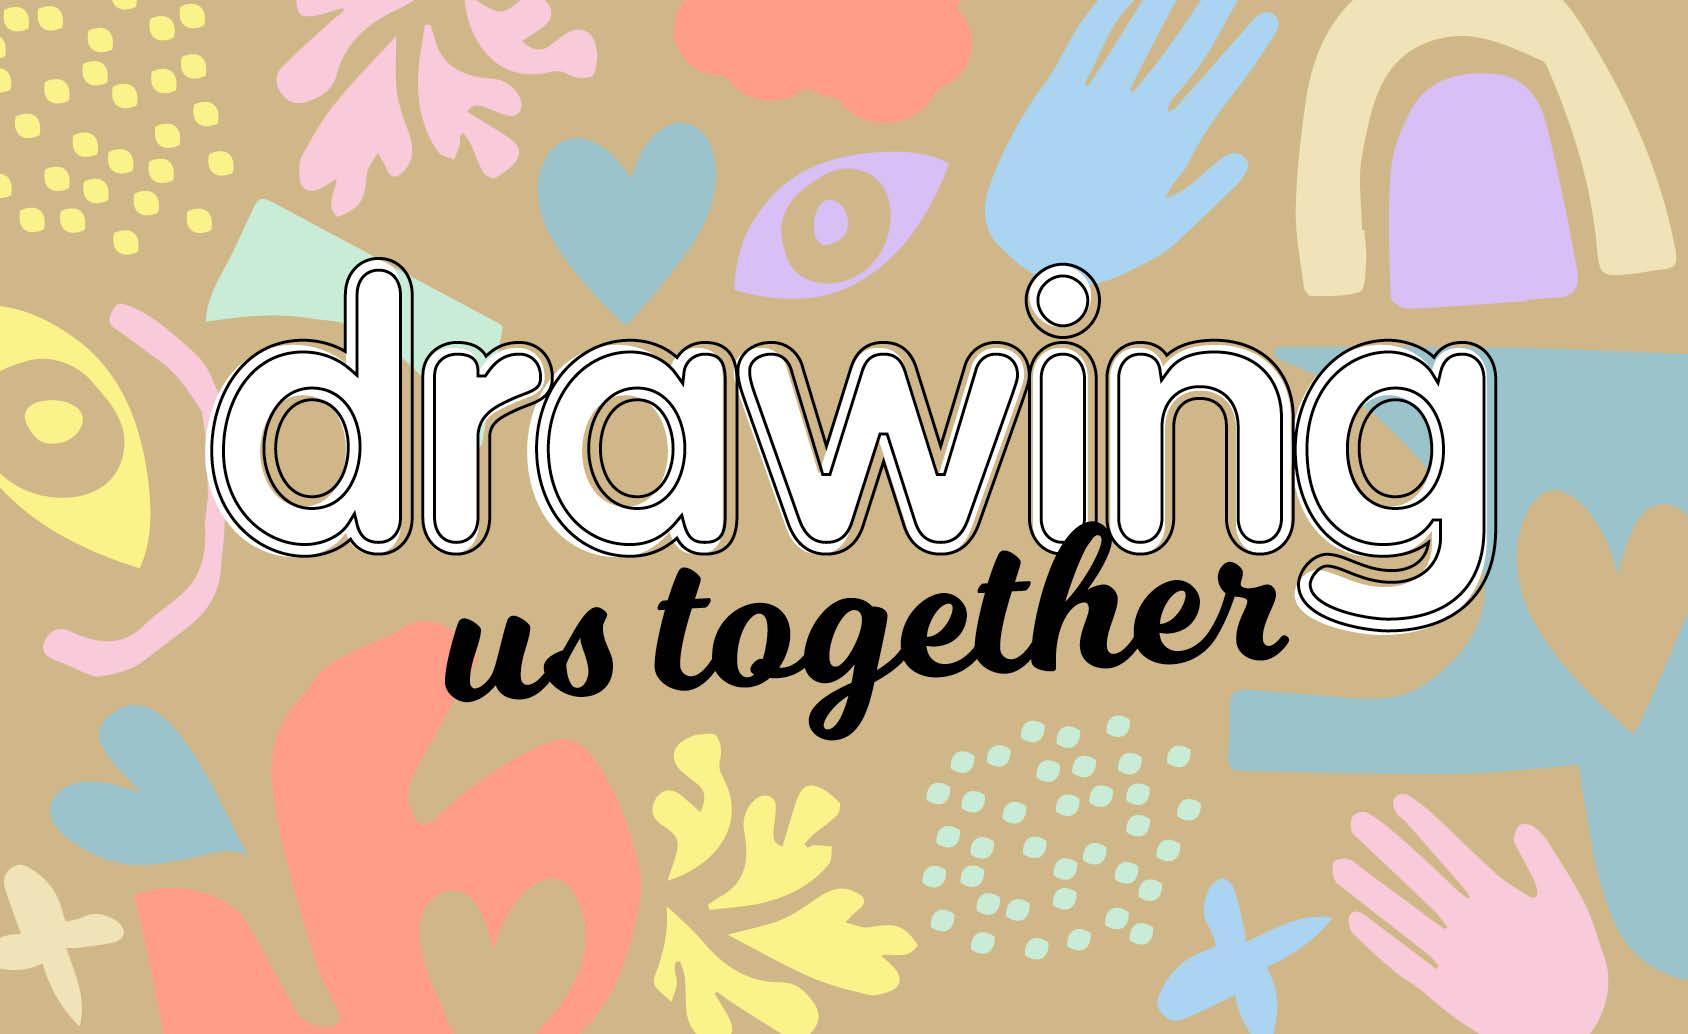 CH5251_Charter Hall_NAIDOC_Community Art Project_Web Tiles_Drawing_844x517